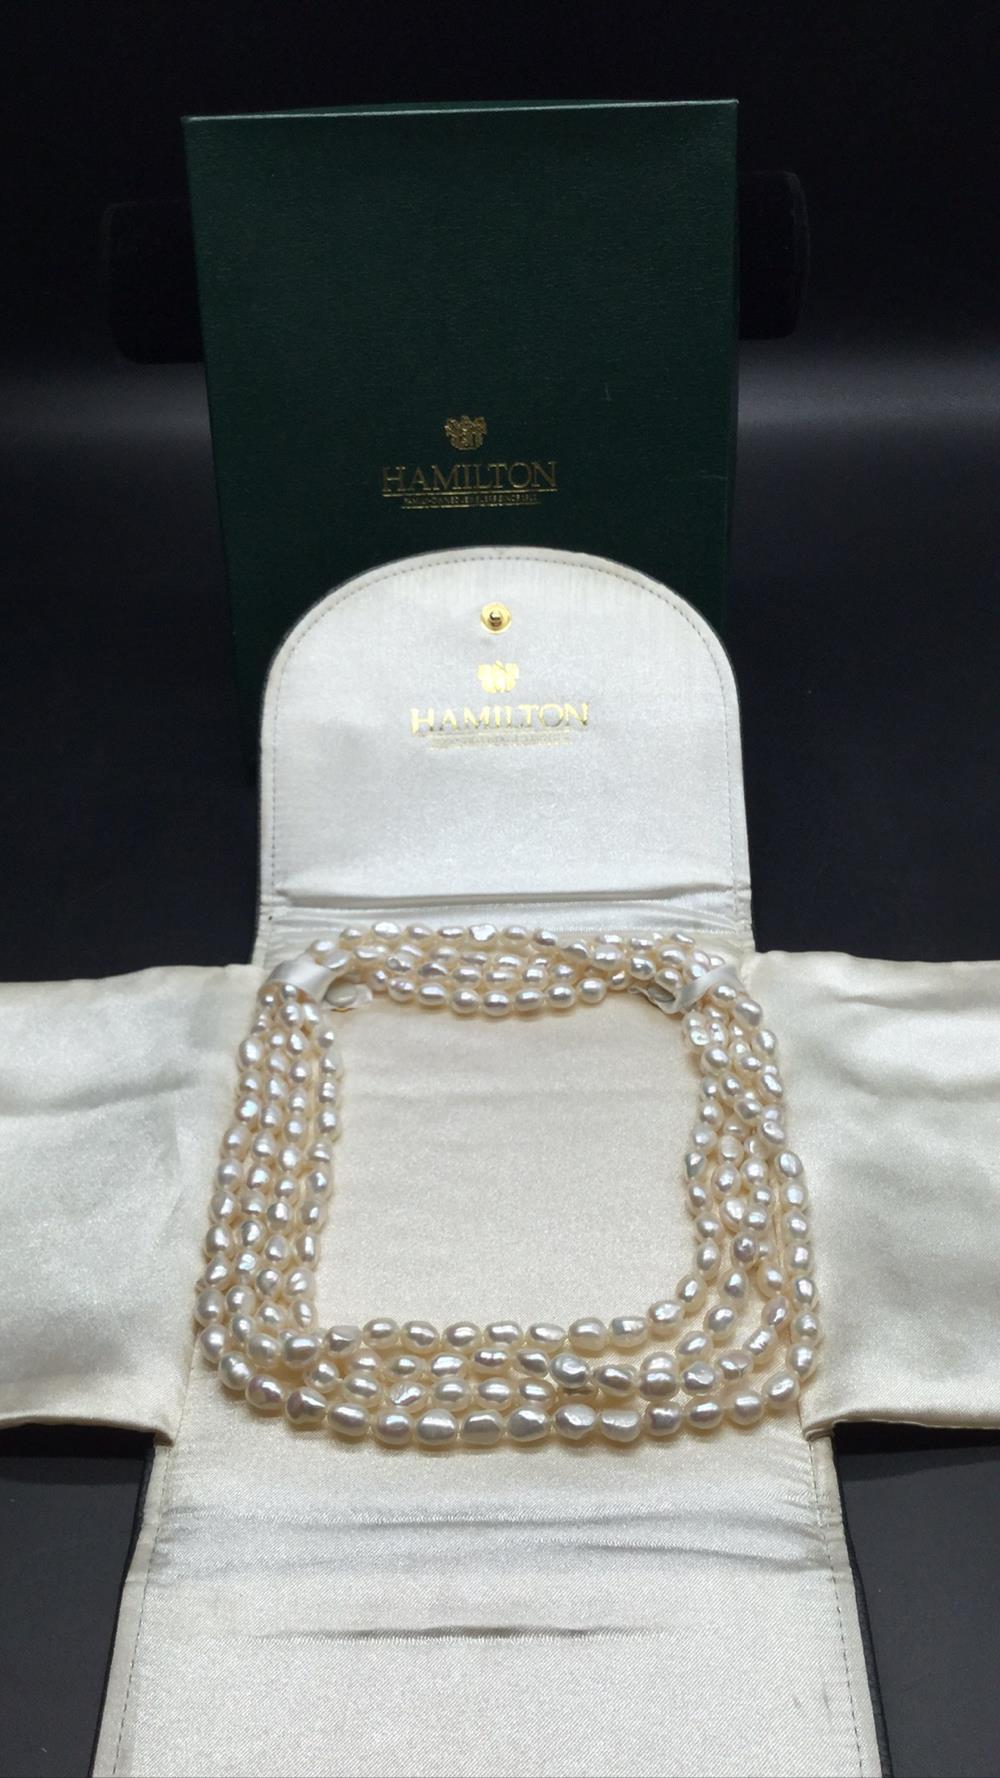 Hamilton artisan fresh pearl strand